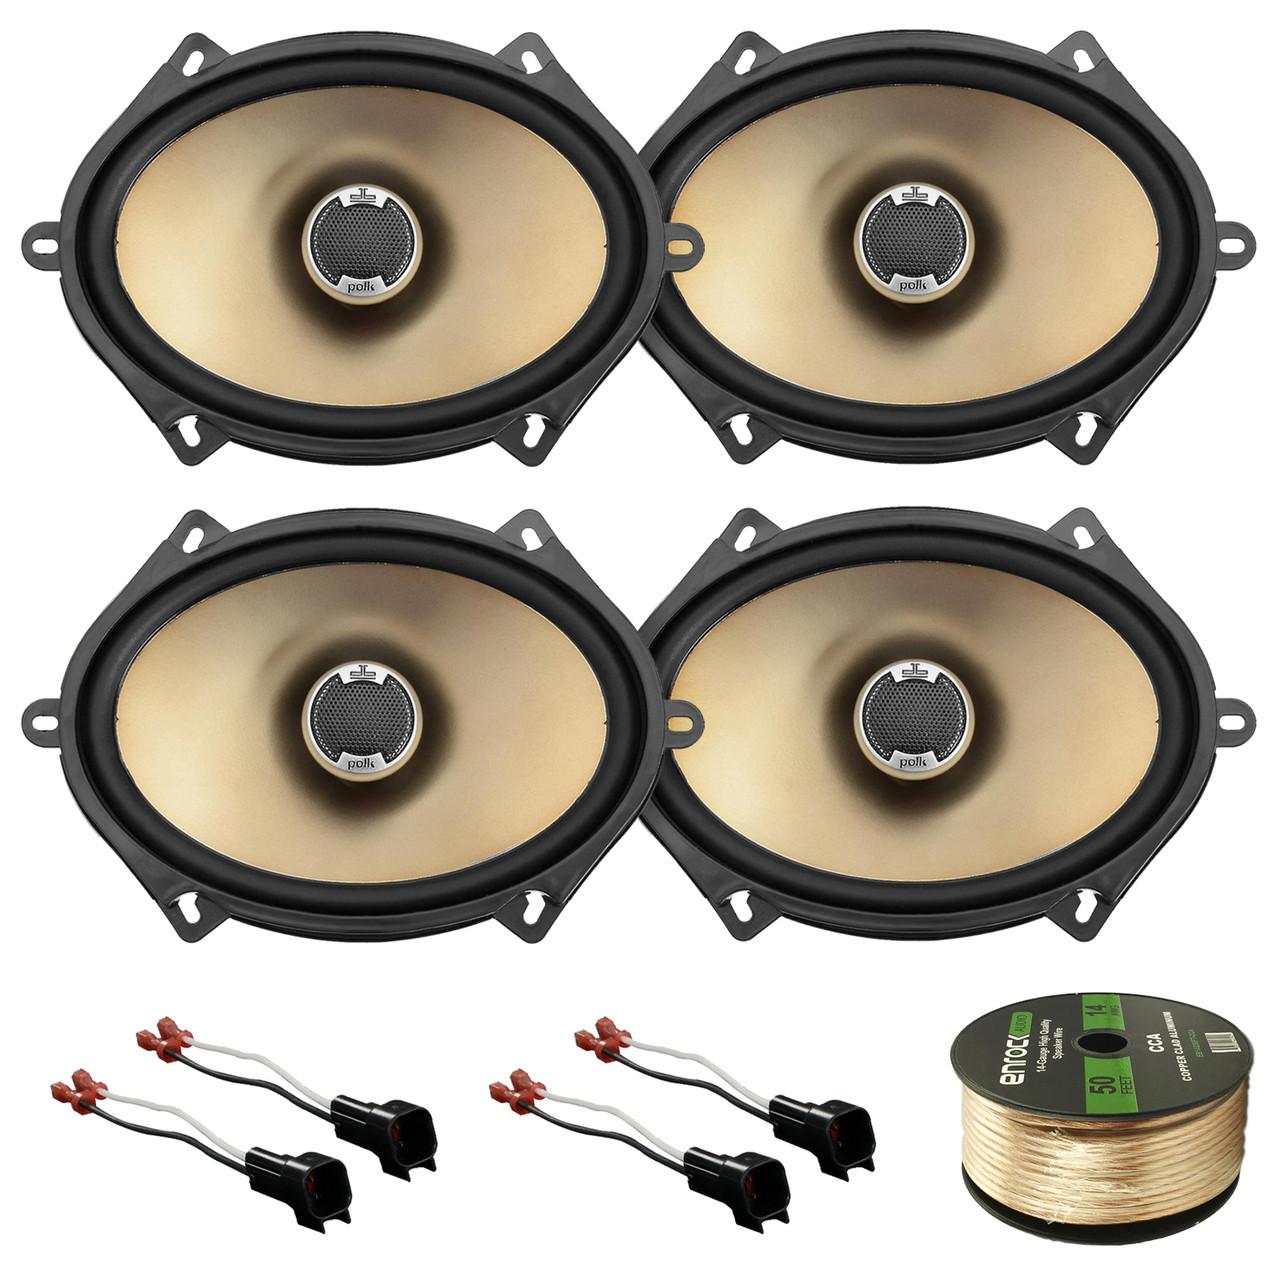 medium resolution of enrock 14 awg gauge 50 feet speaker wire 2 x db571 x new pair polk audio car audio 5 x 7 2 way car audio speakers 180 watts max